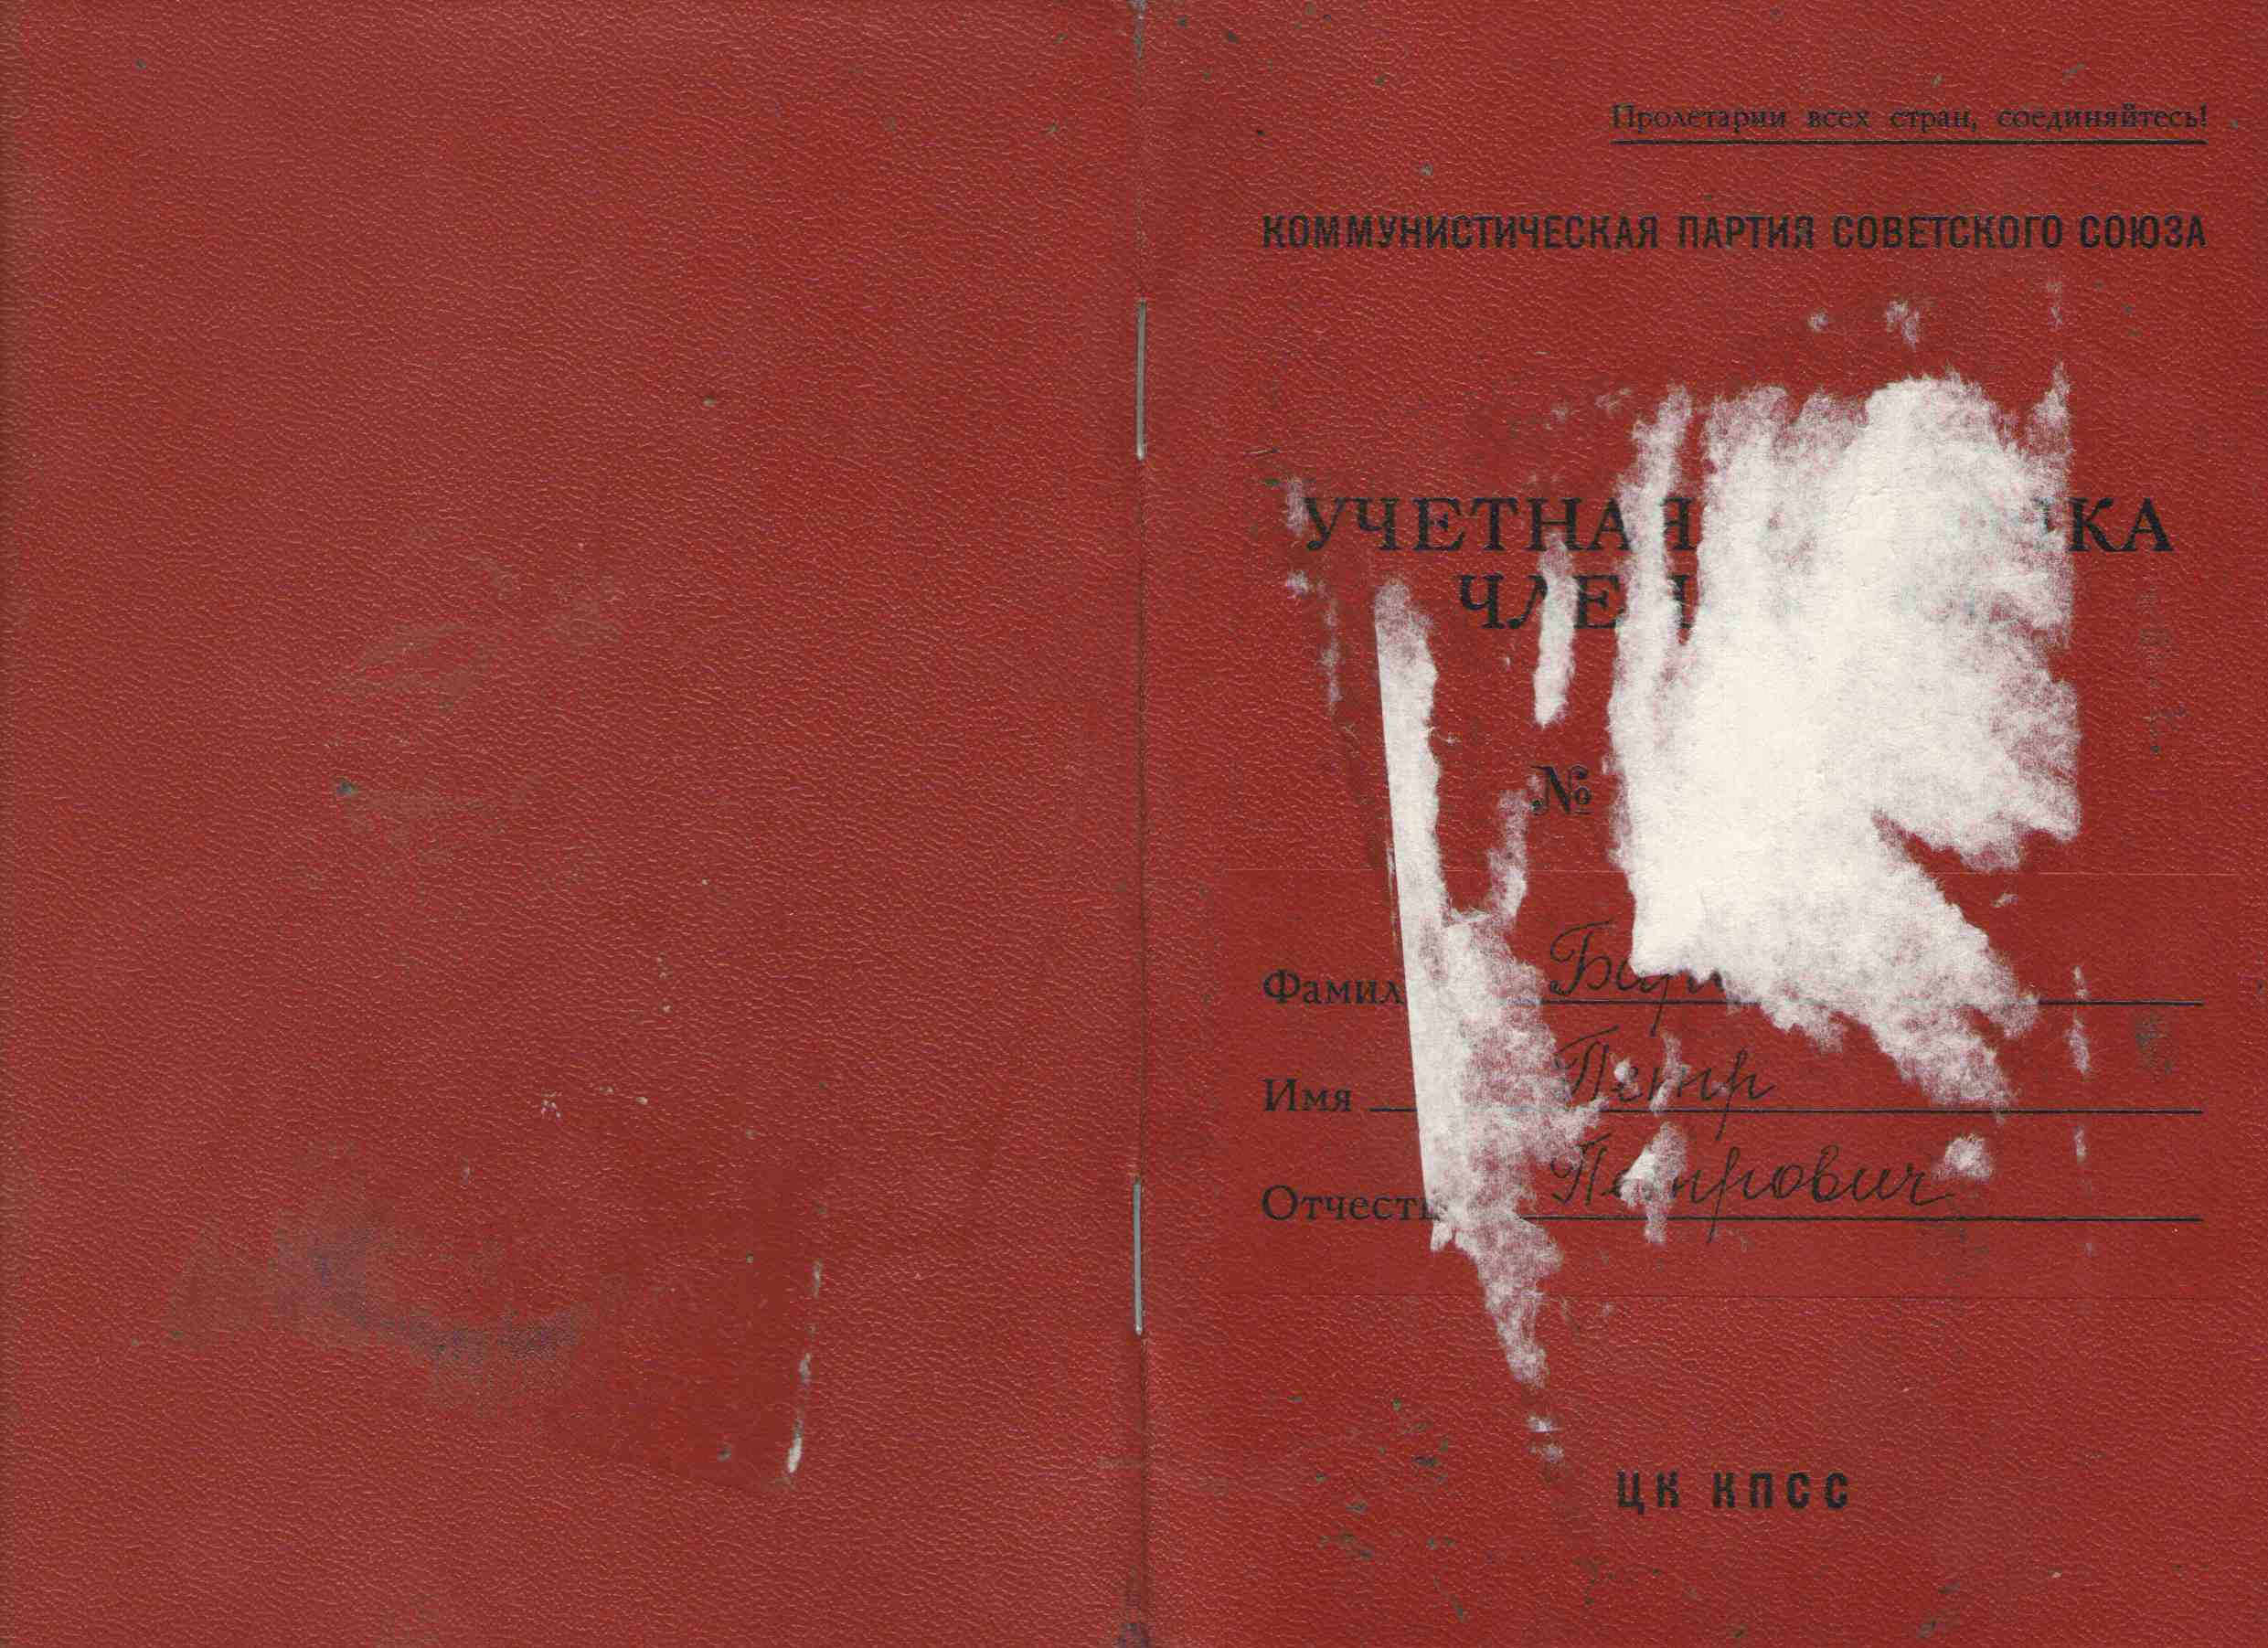 78. Учетная карточка члена партии Барыкина ПП, 1974.